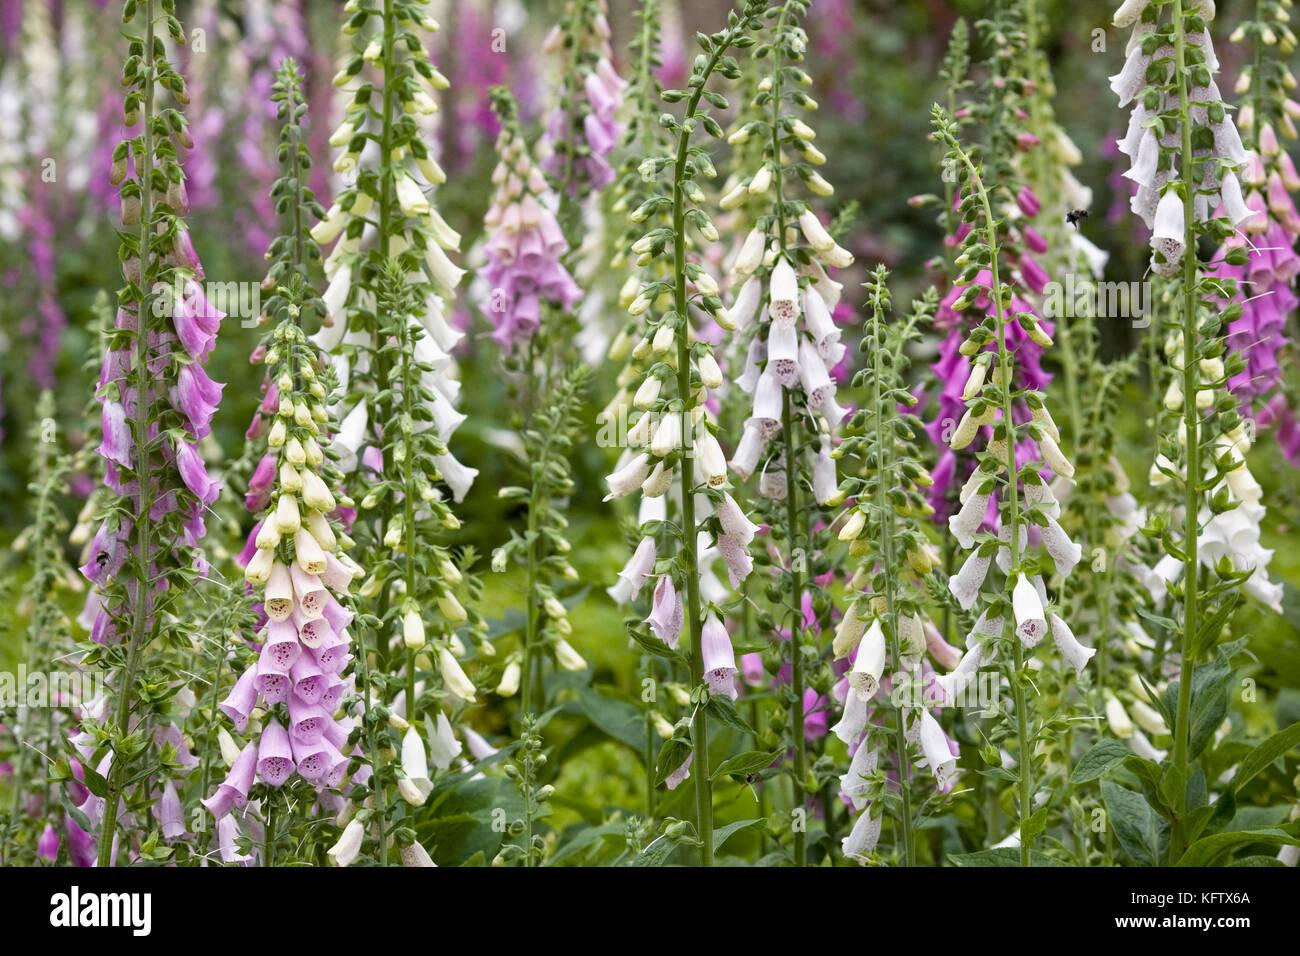 Digitalis purpurea. Foxgloves in the garden. - Stock Image